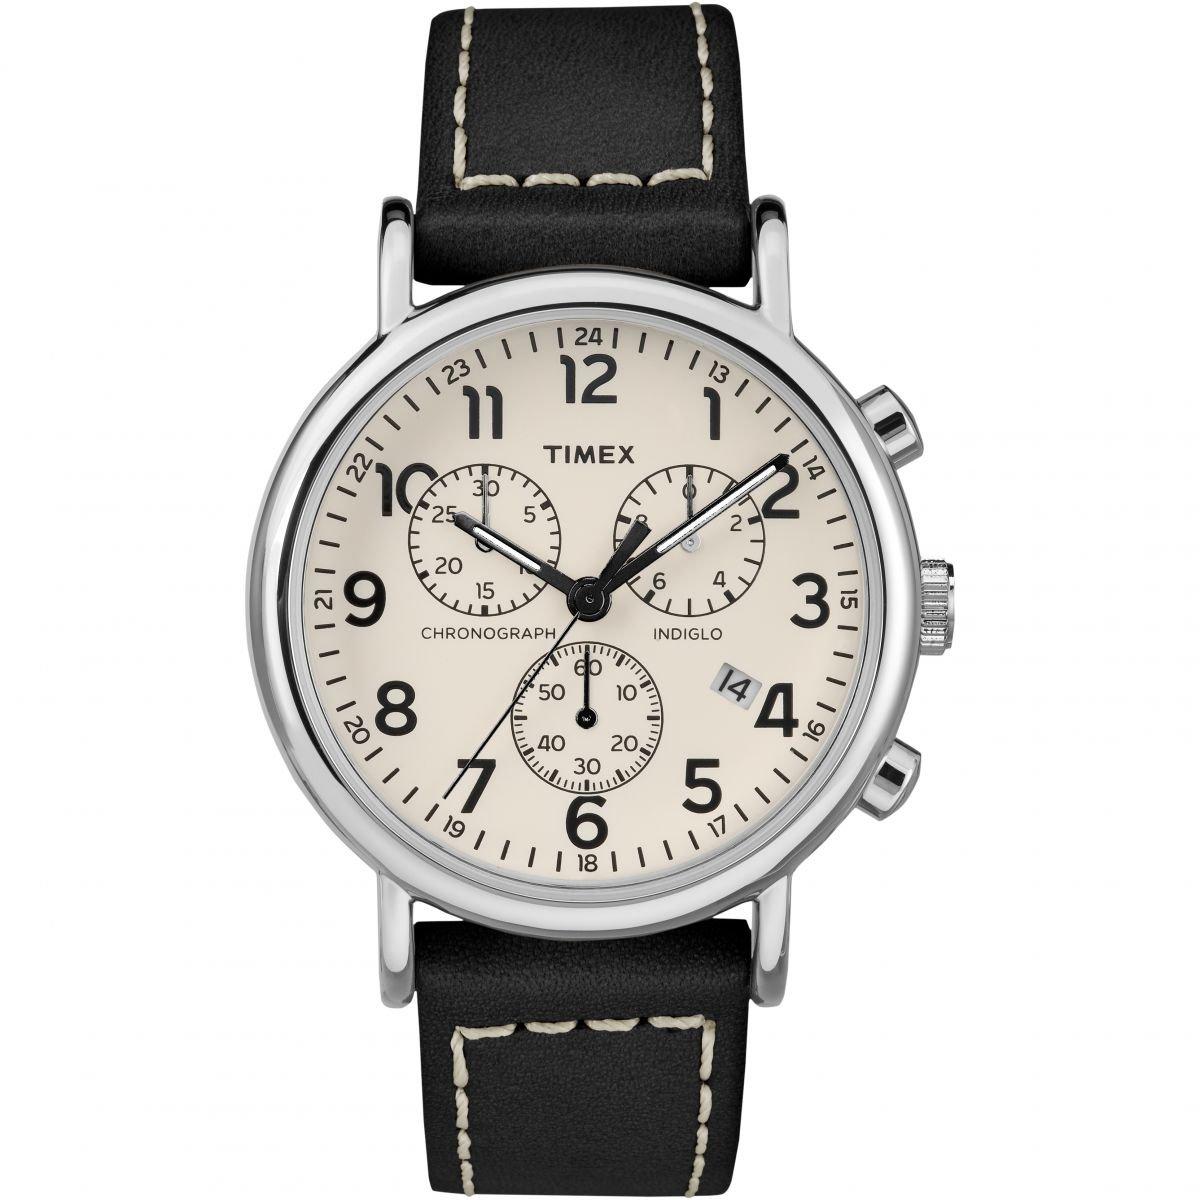 Timex Gents Weekender Chronograph Watch Tw2 R42800 by Timex